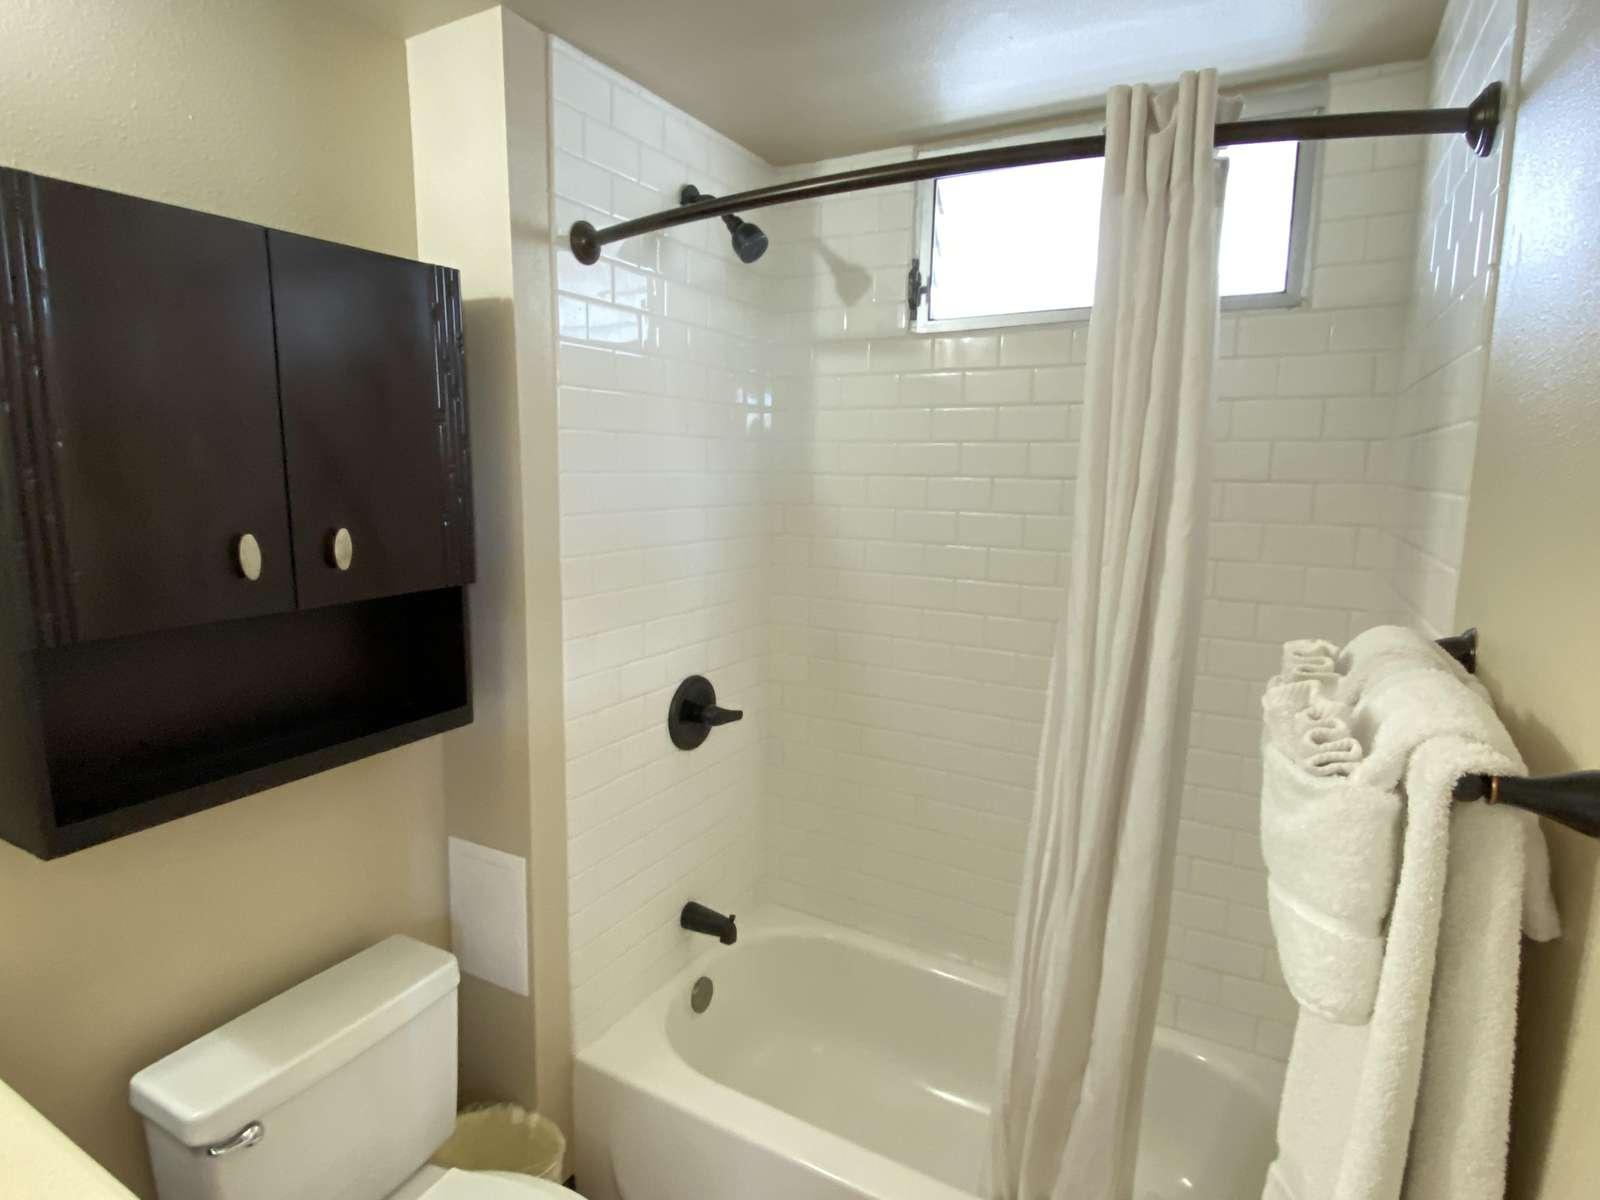 Shower tub combo - Great for family living.